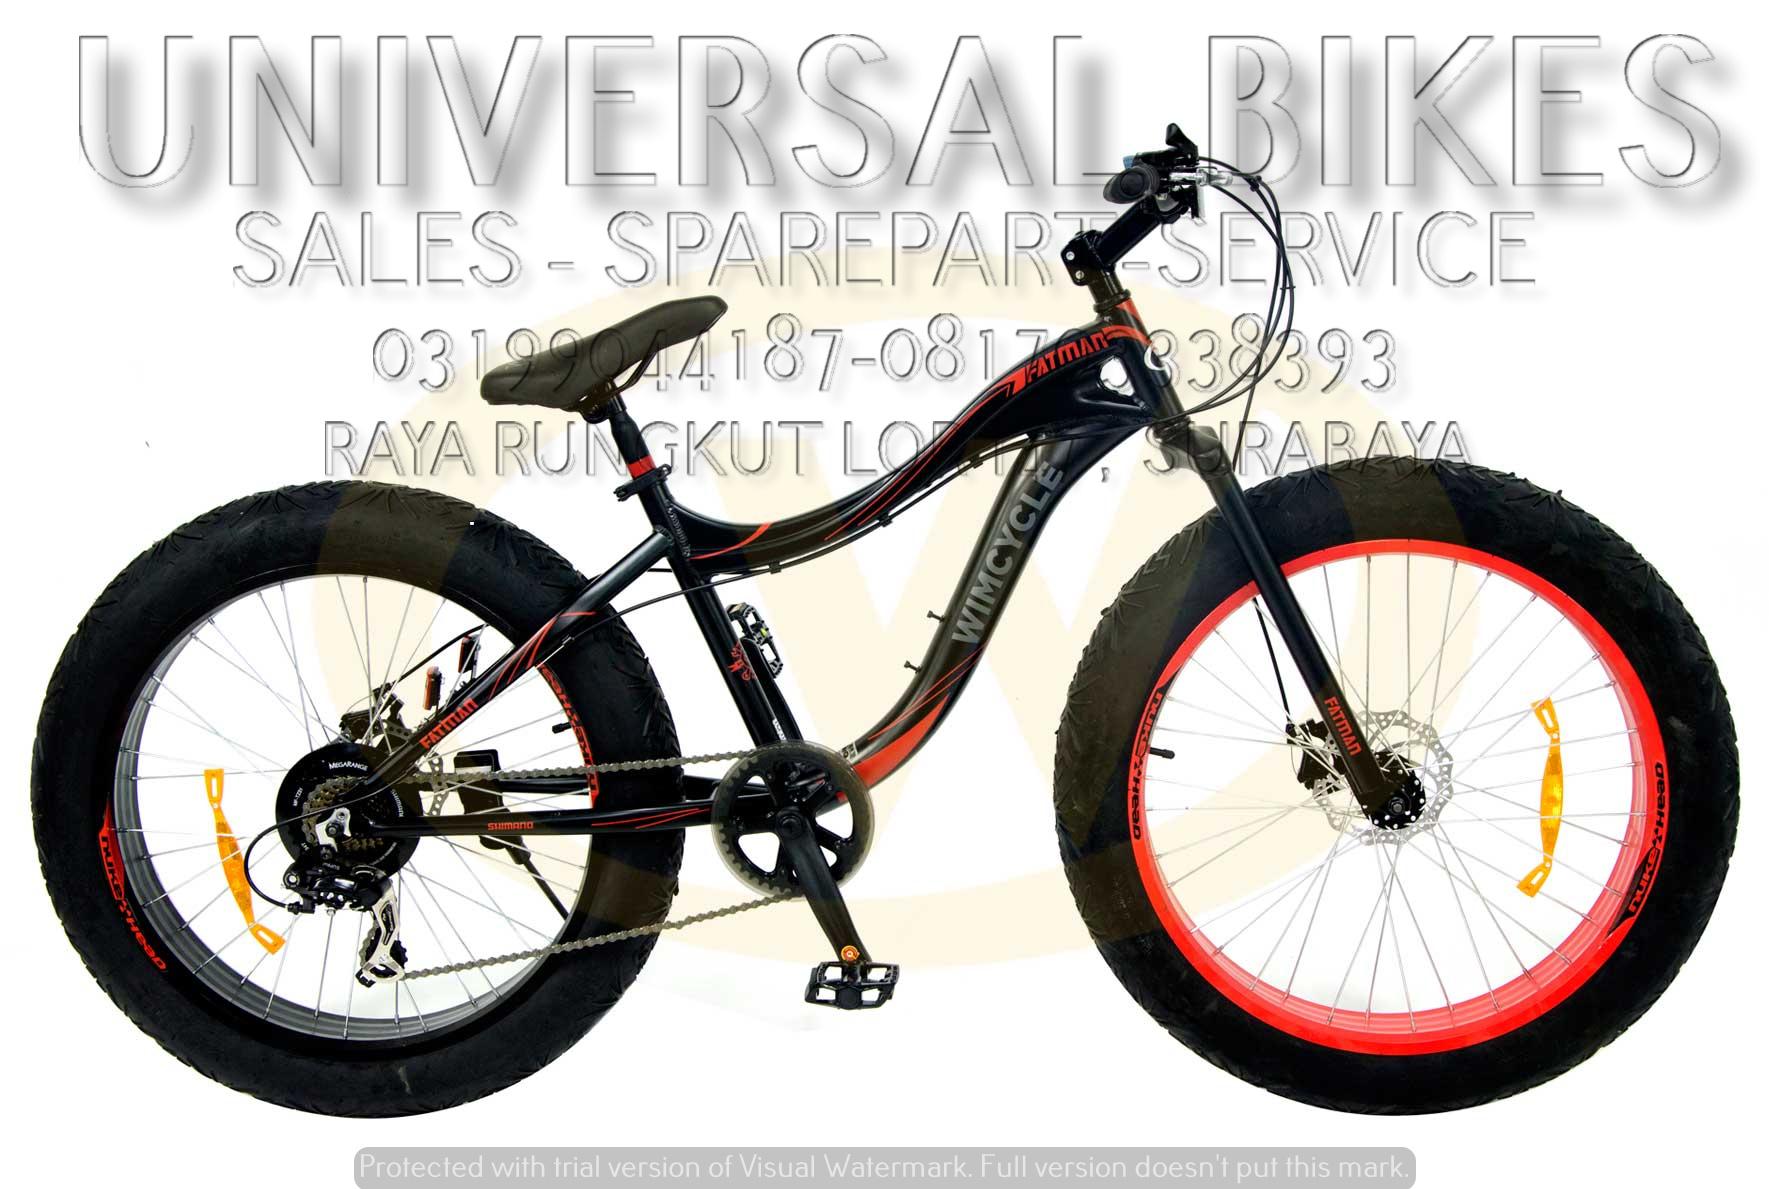 grosir sepeda wimcycle surabaya 081703338393 grosir